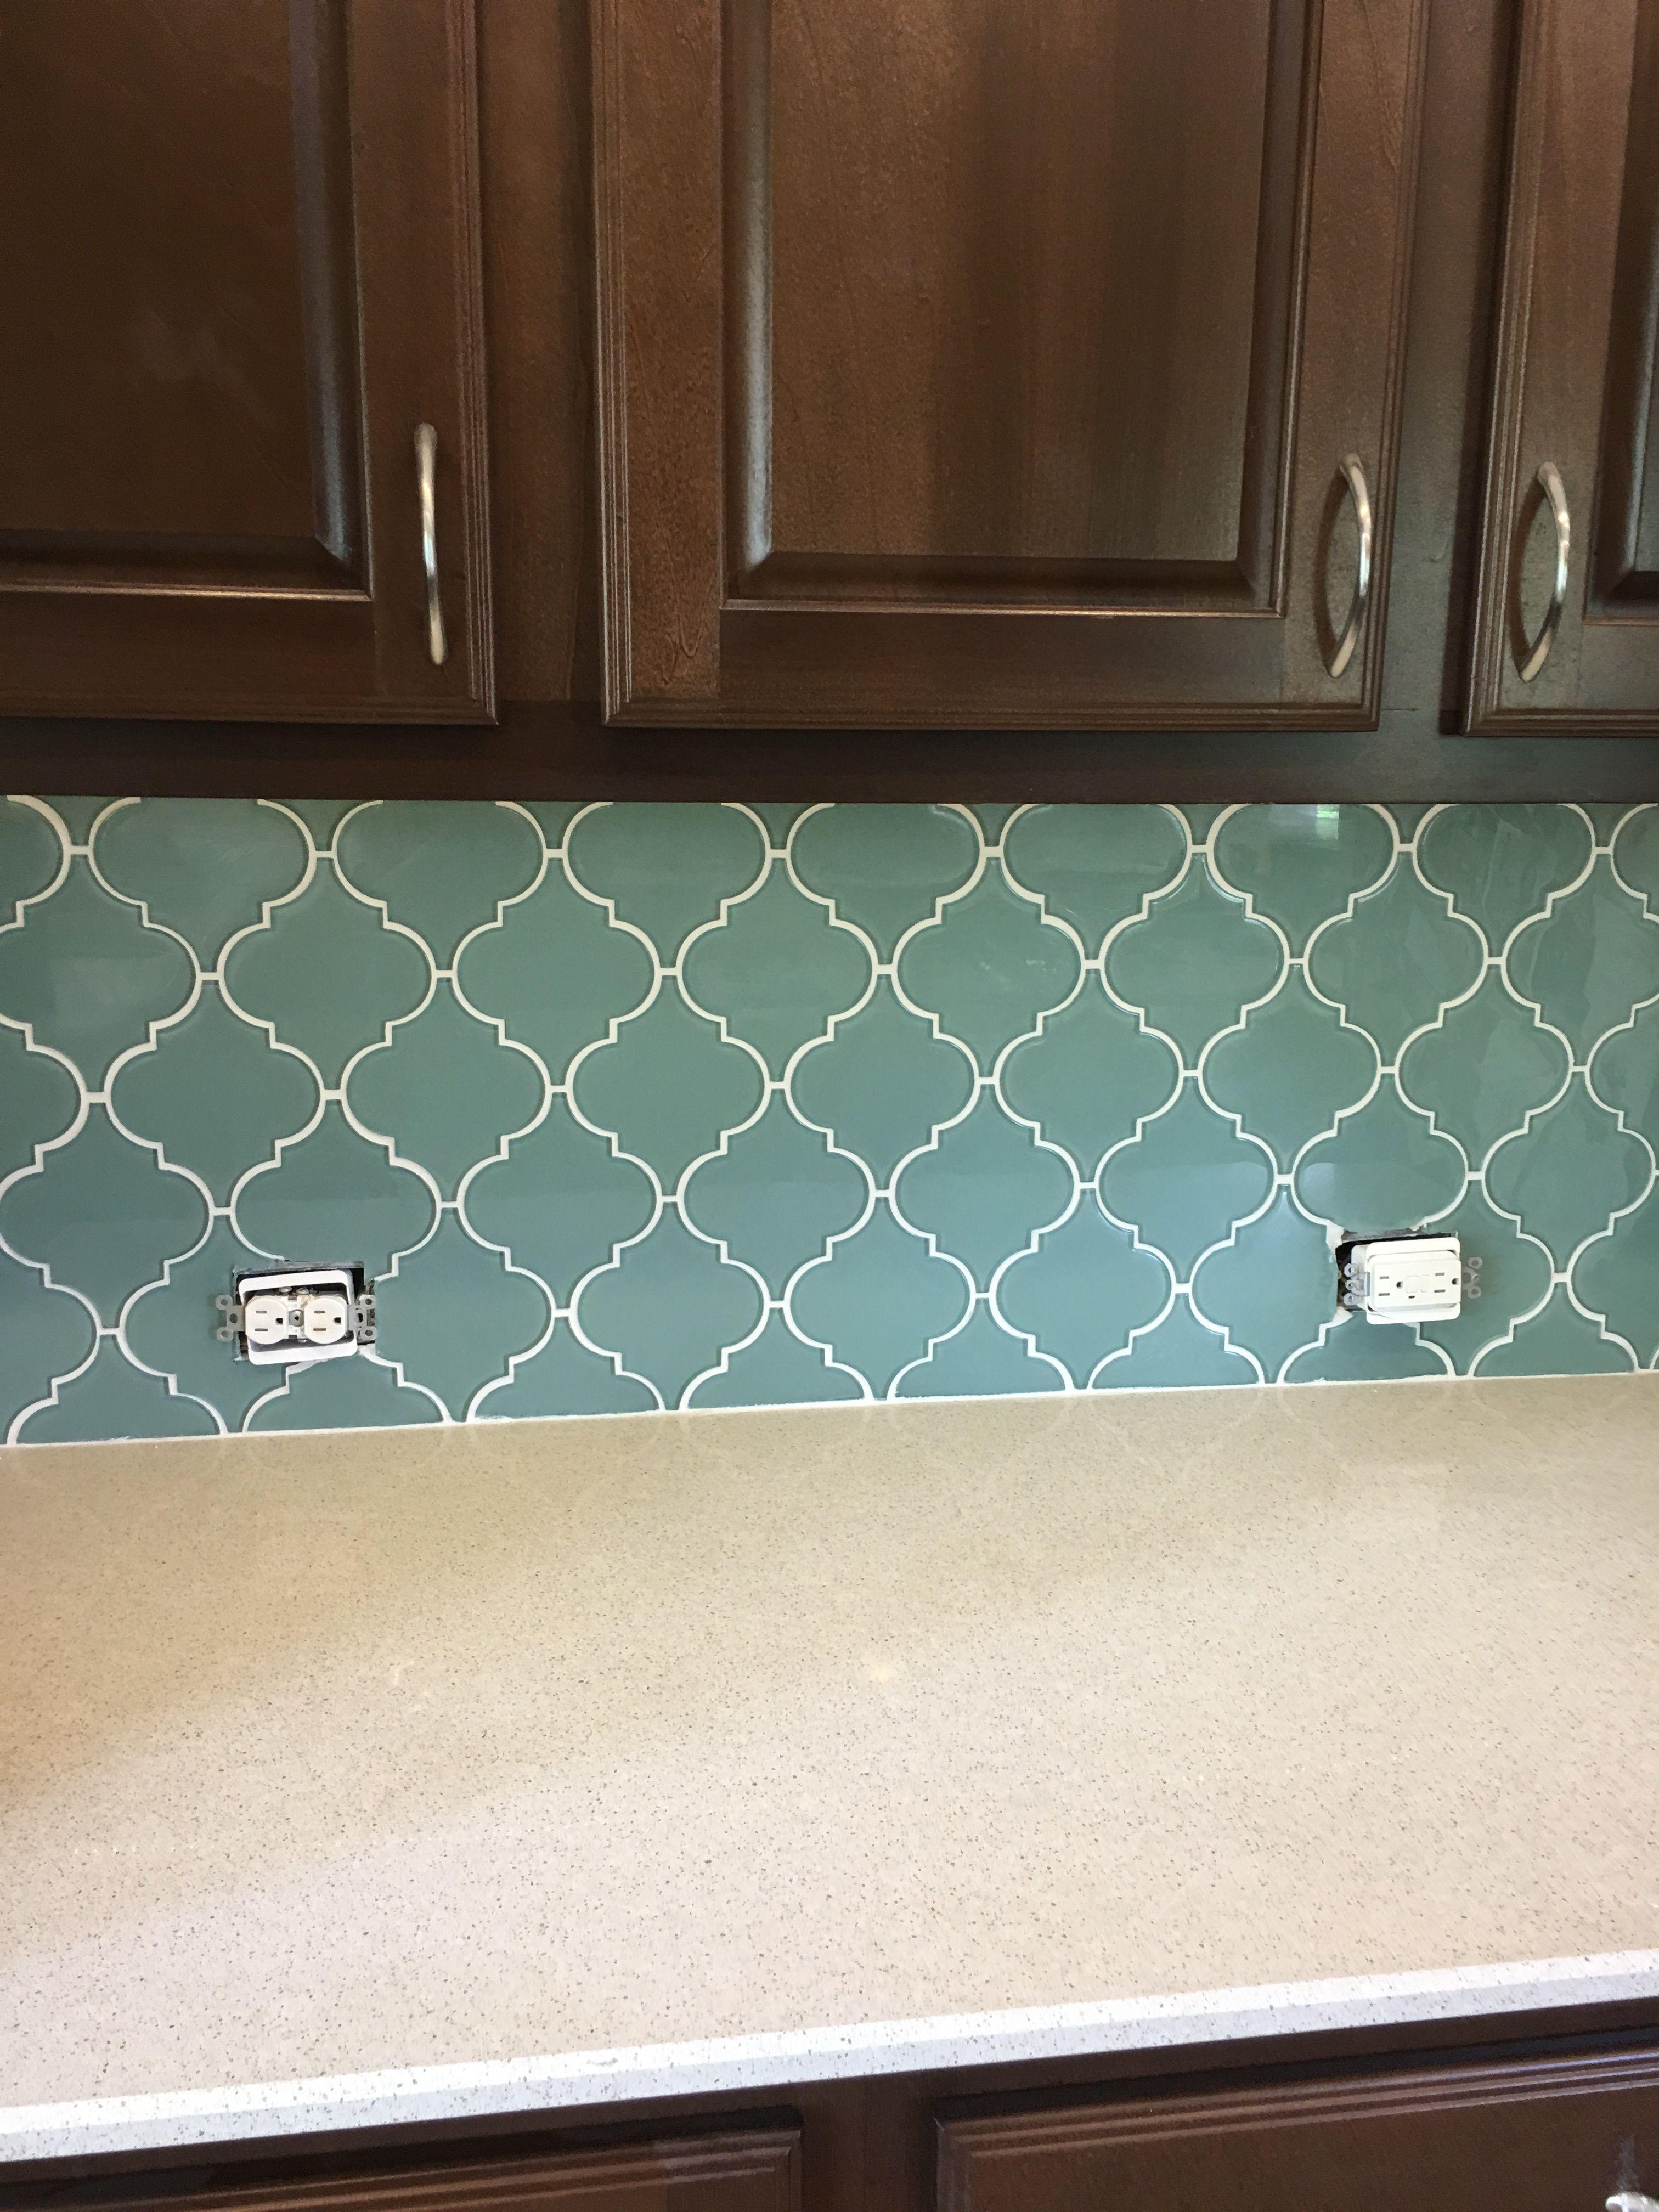 Rocky Point Tile Bring A Touch Of Elegance To Your New New Kitchen Backsplash Or Bathroom With Arabesque Tile Backsplash Aqua Glass Tiles Glass Mosaic Tiles